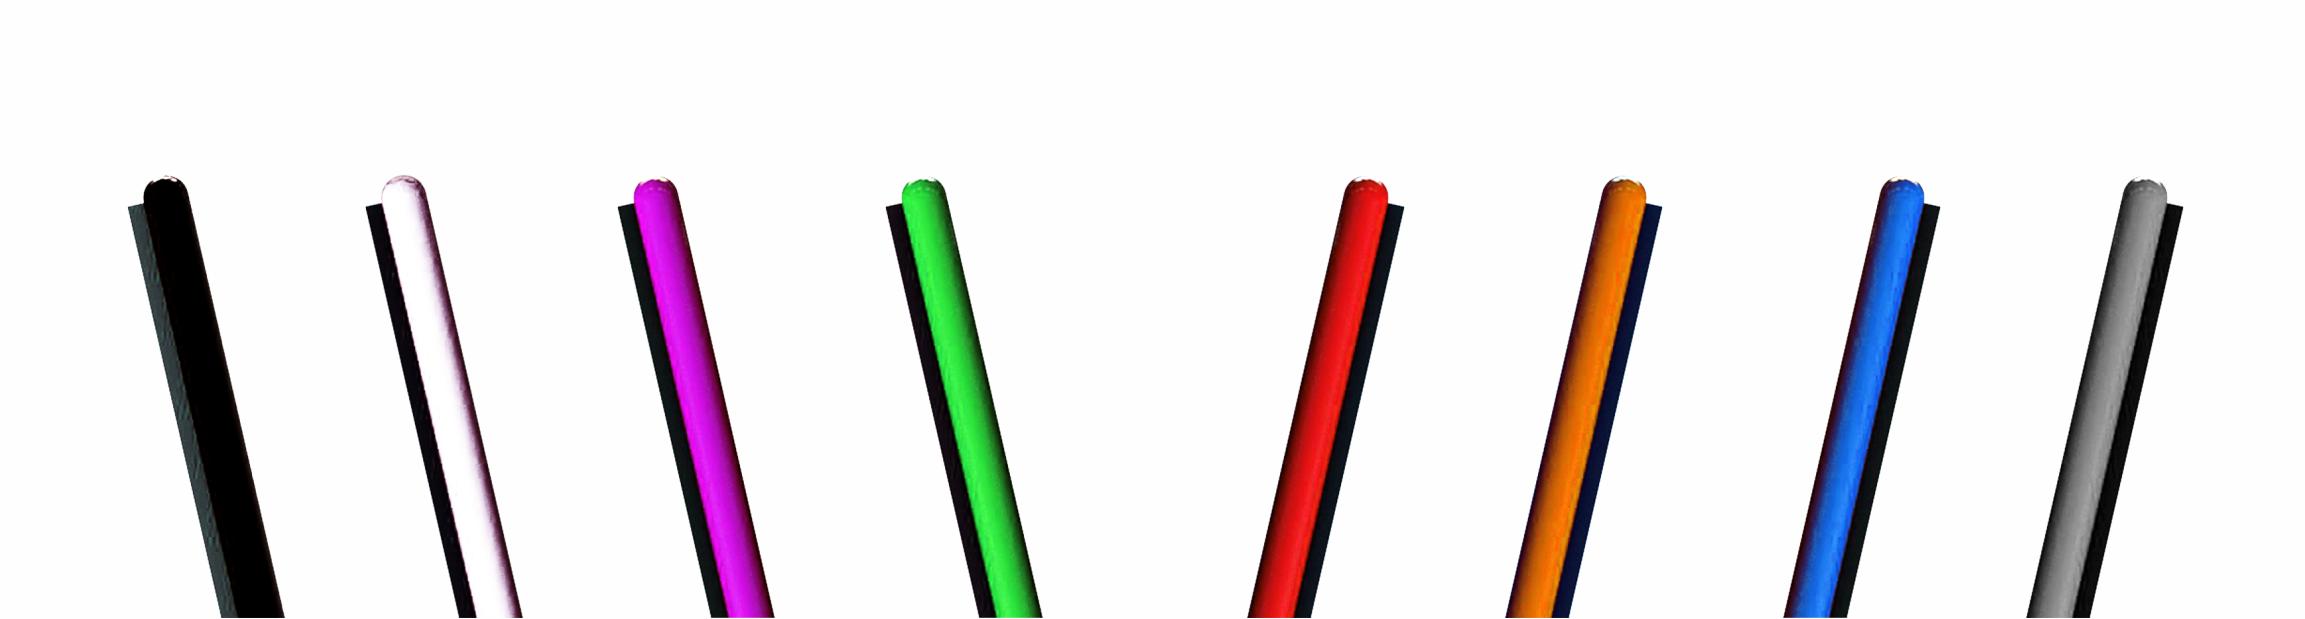 Montaje pantallas led N-Mirror conectadas